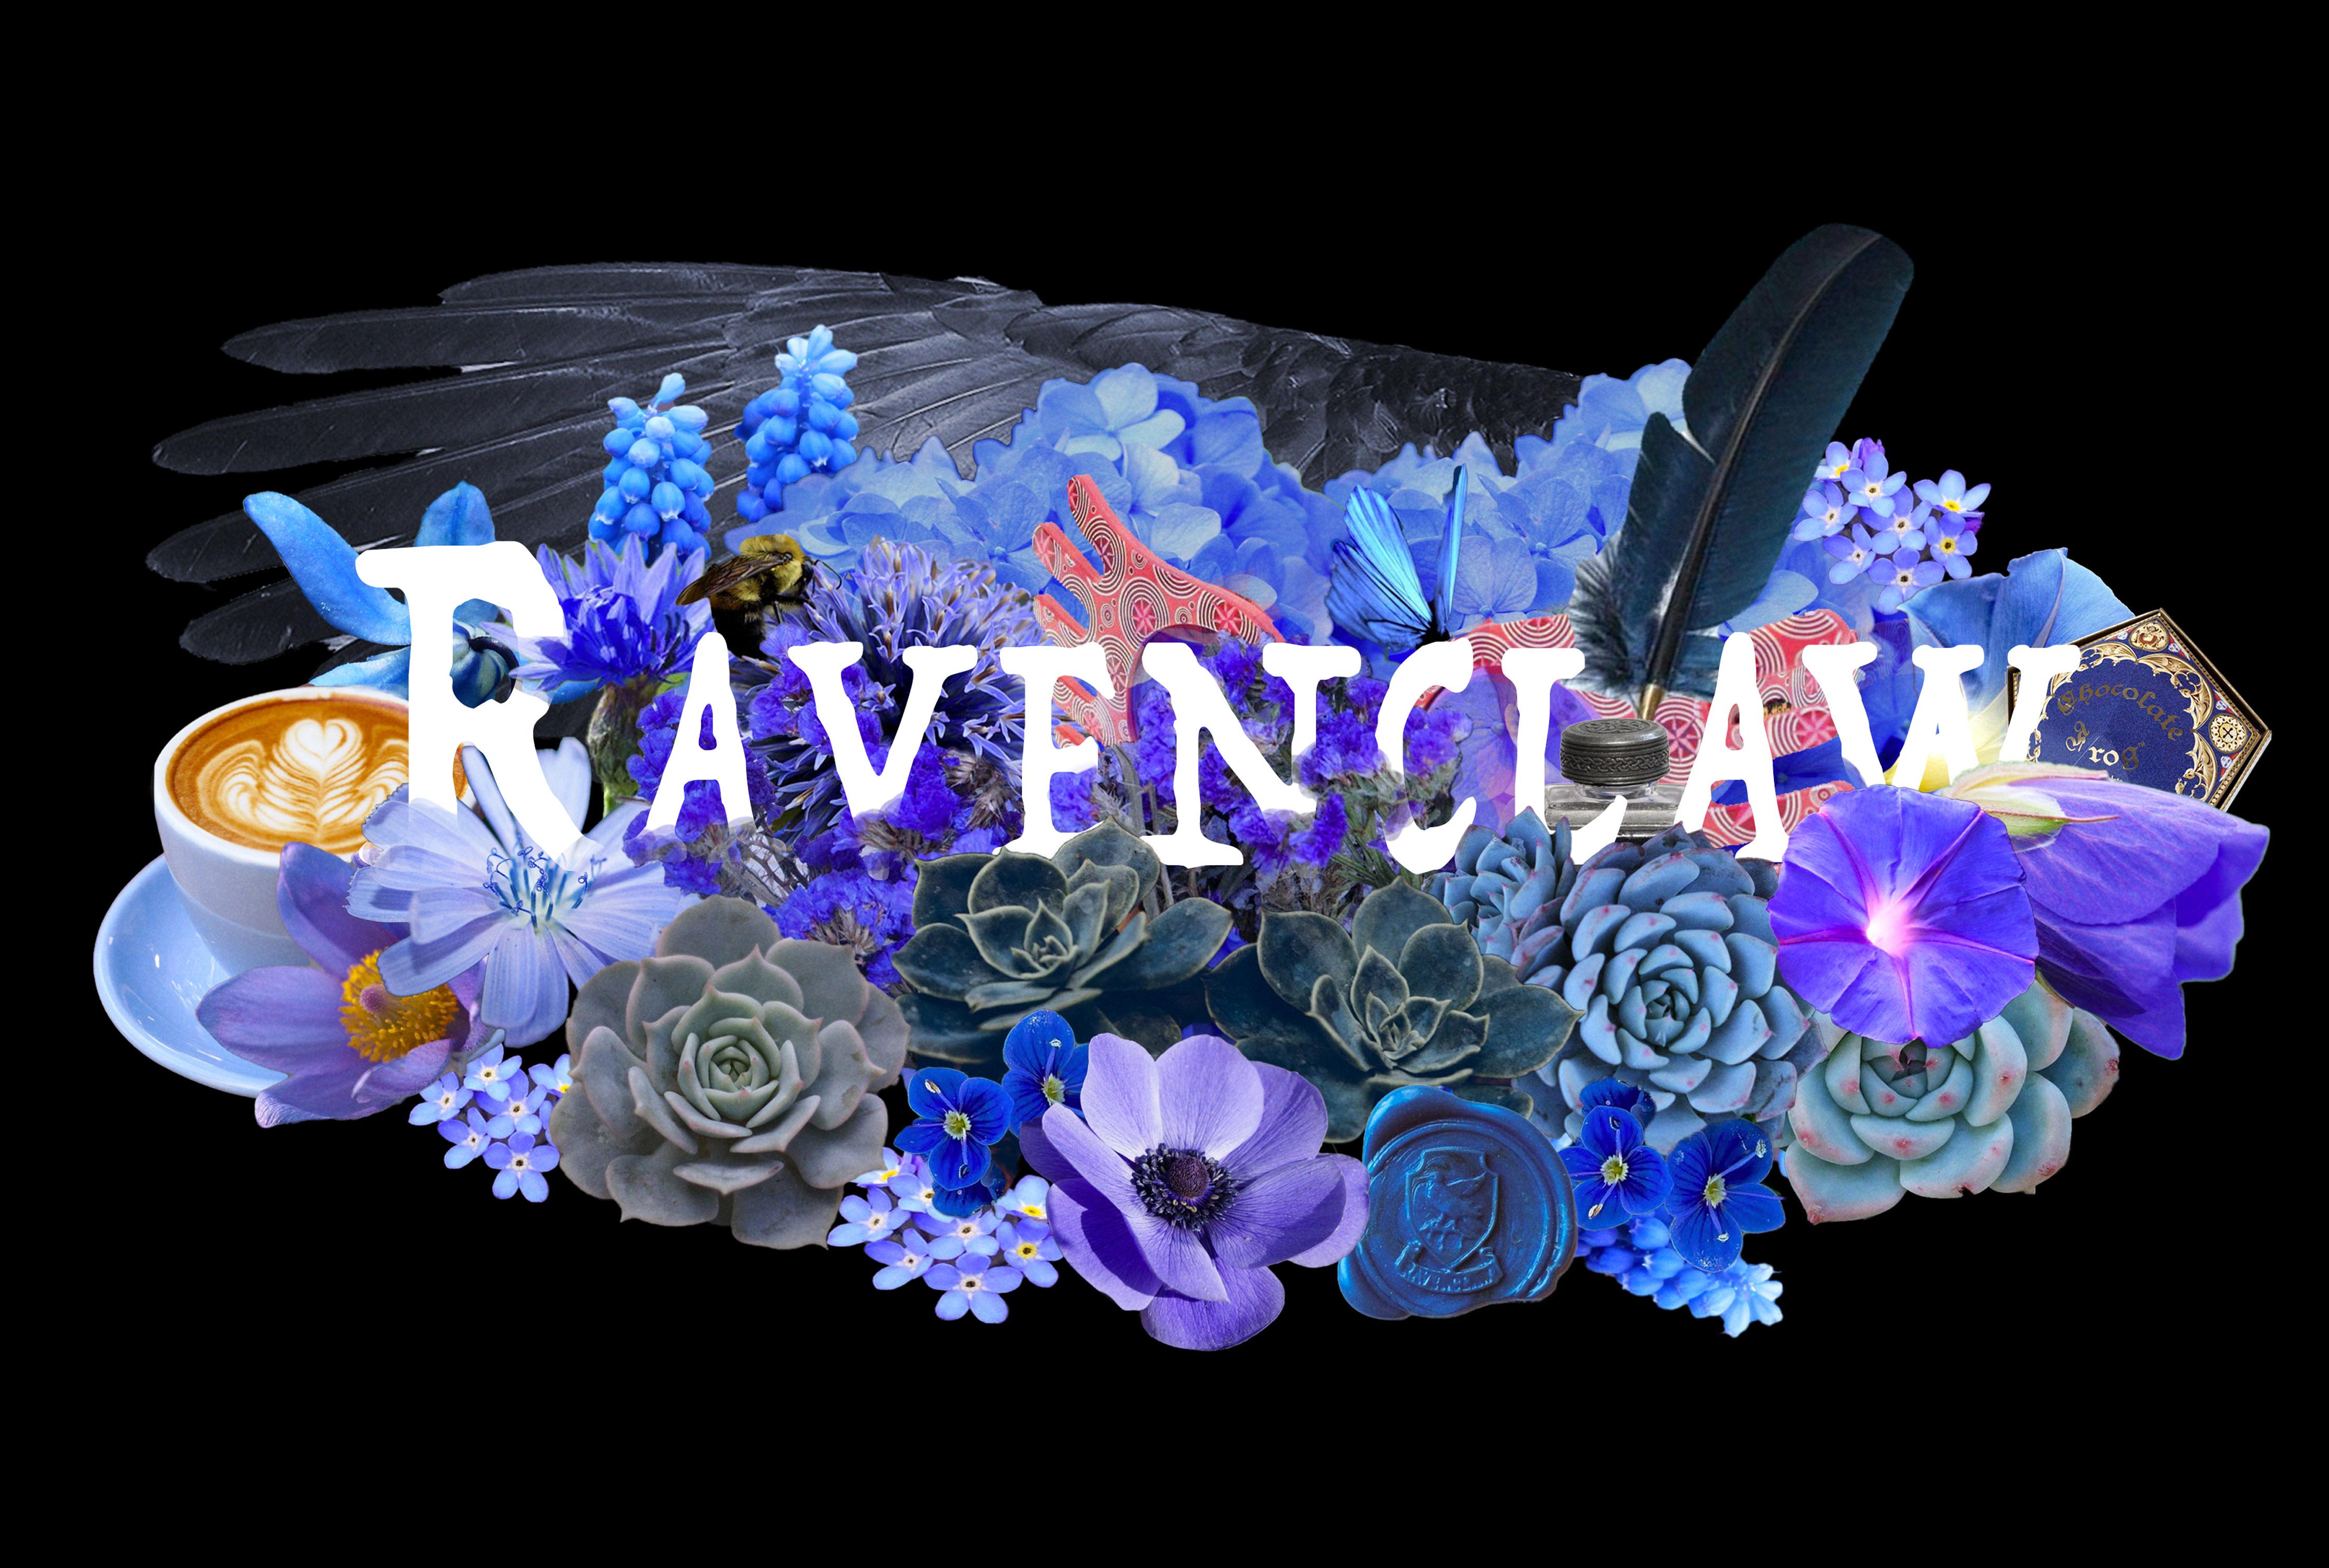 ravenclawfloral